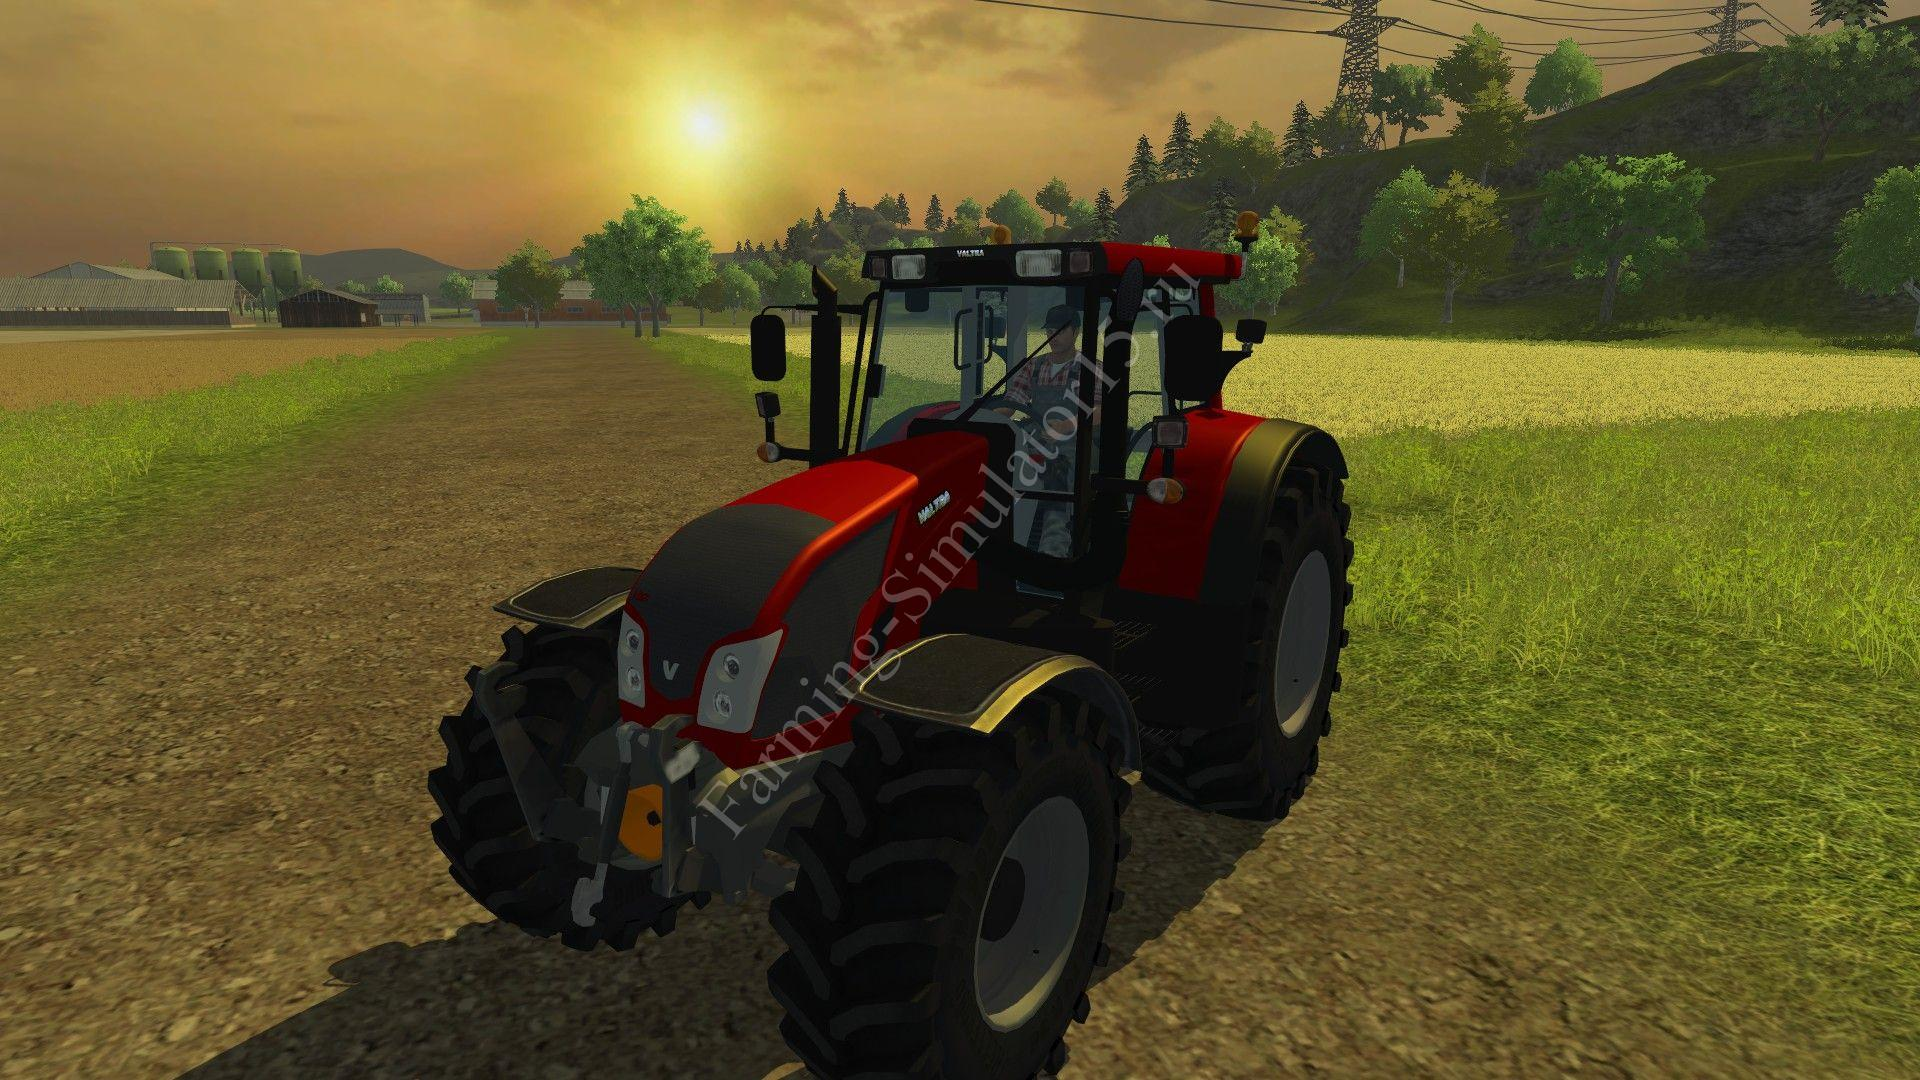 Мод трактора Valtra N163 v 2.2 Farming Simulator 2013, Farming Simulator 13